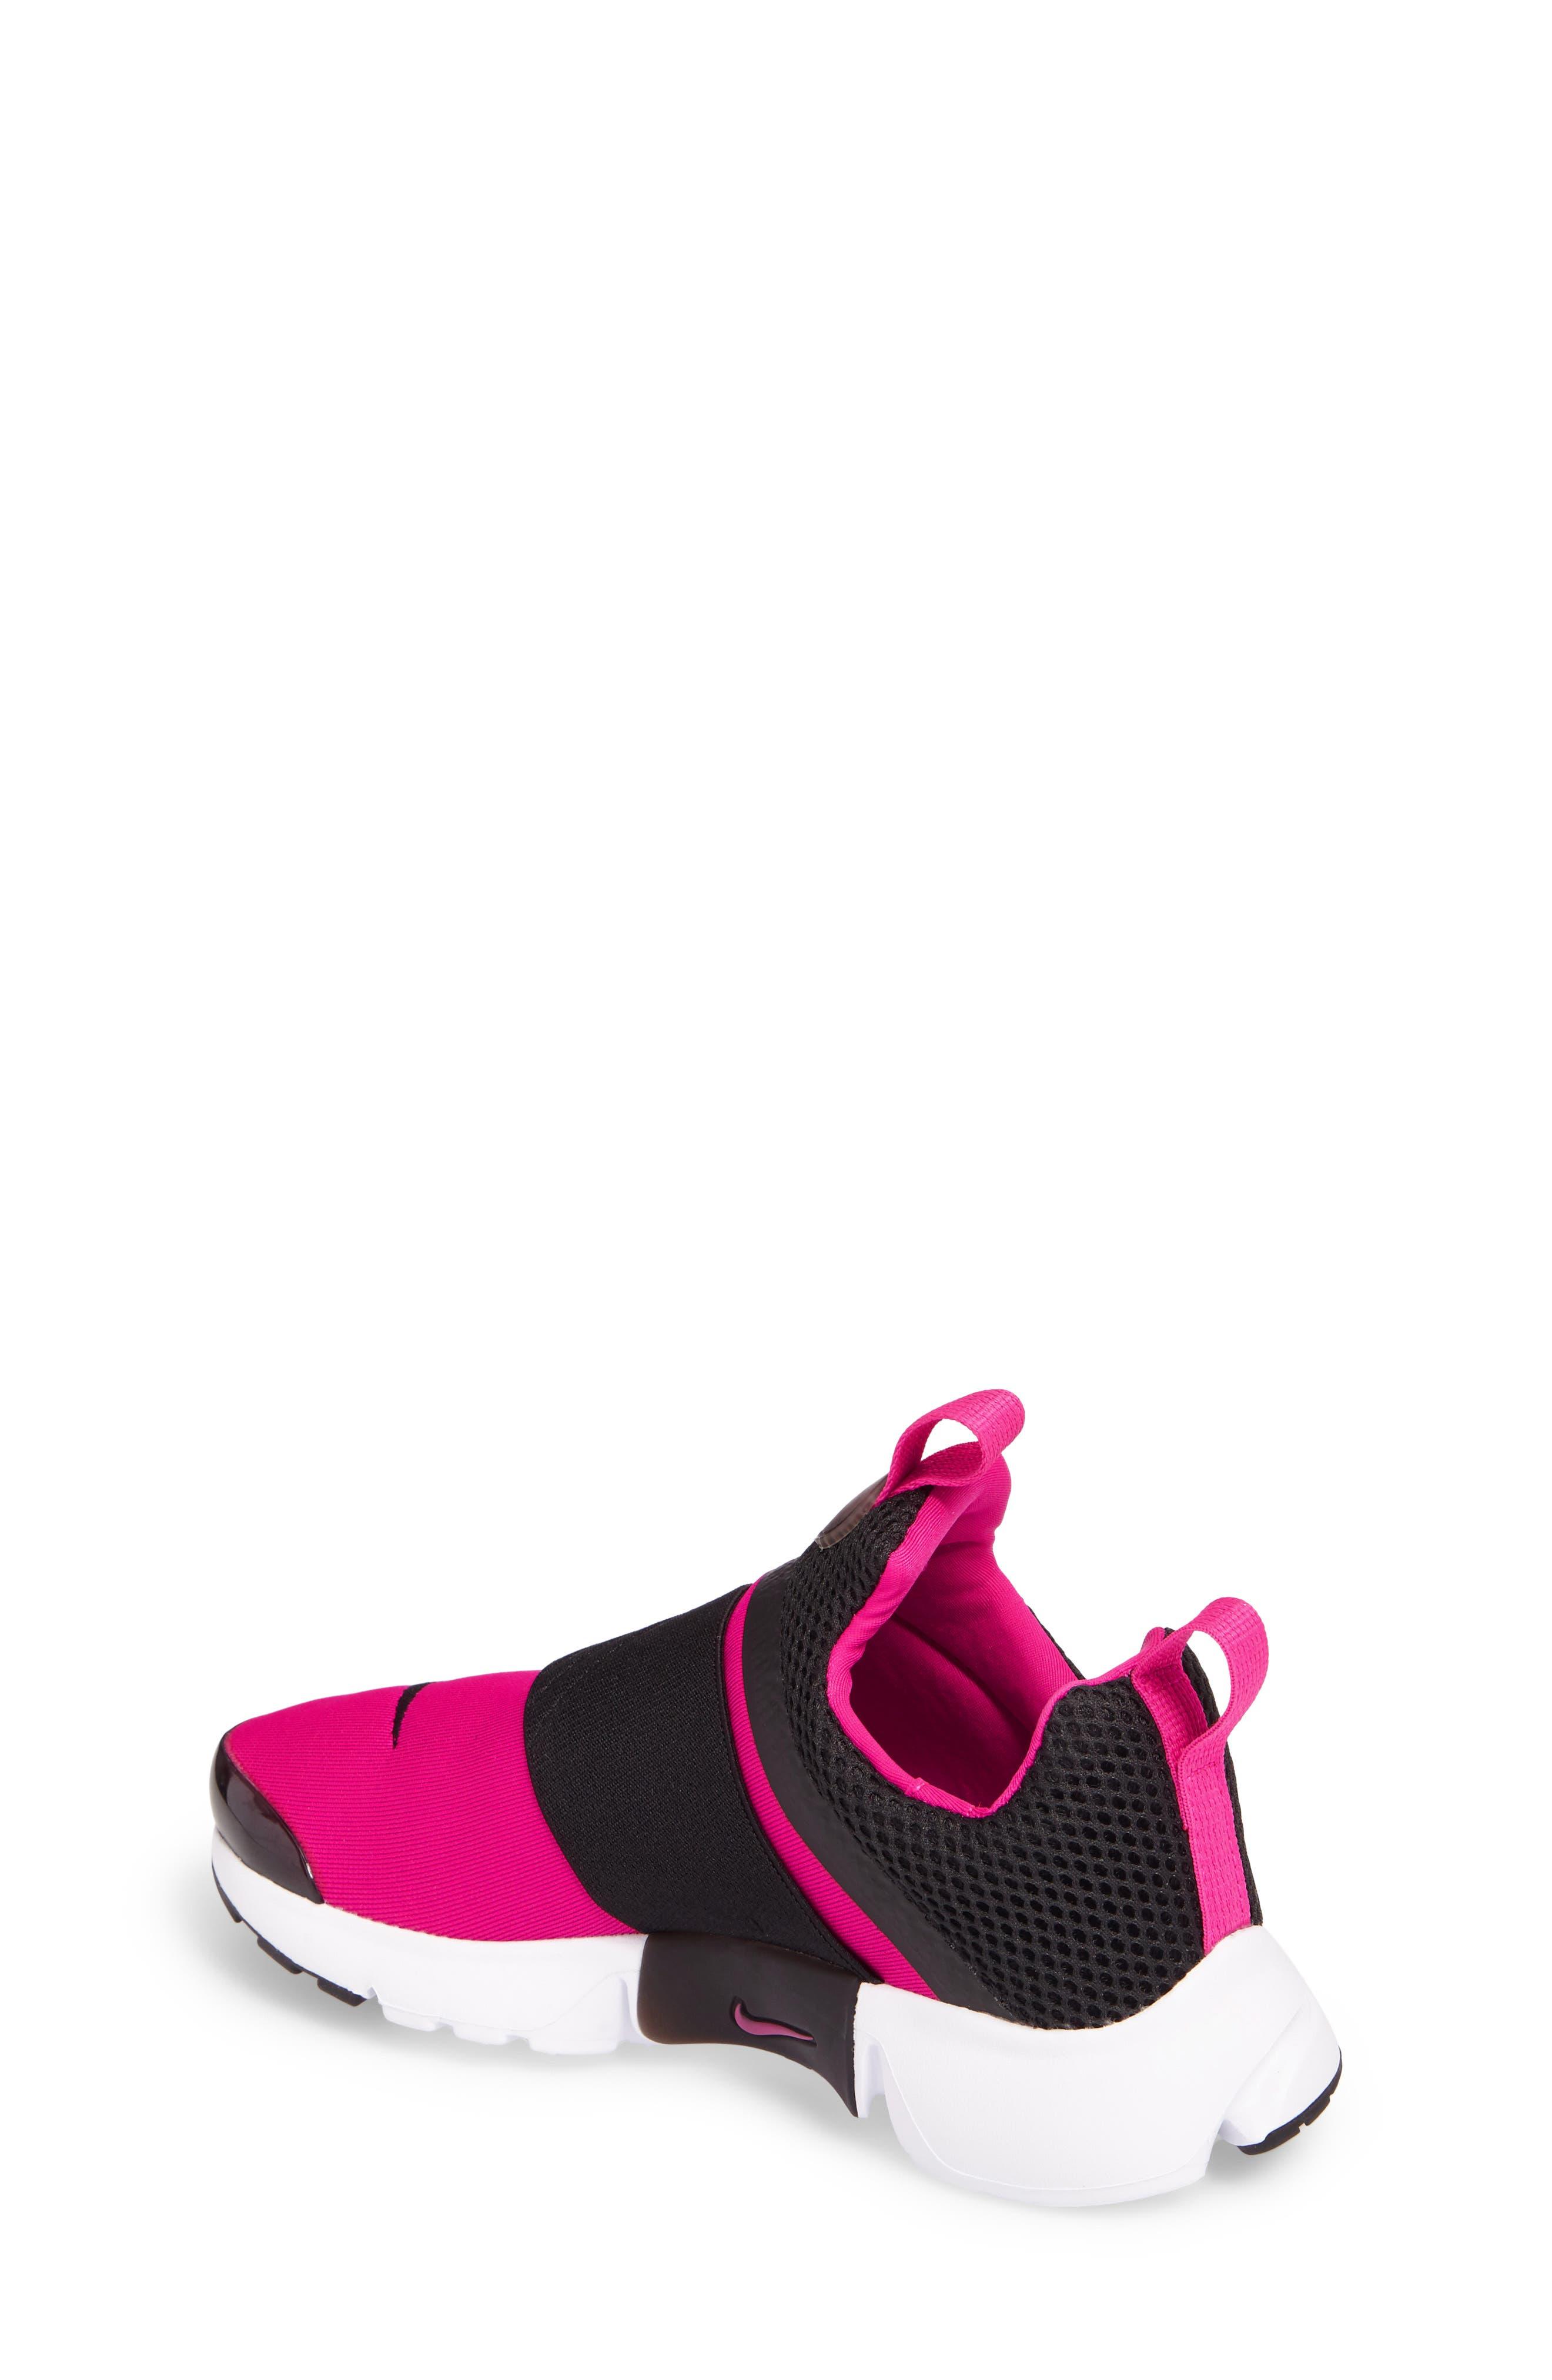 Presto Extreme Sneaker,                             Alternate thumbnail 8, color,